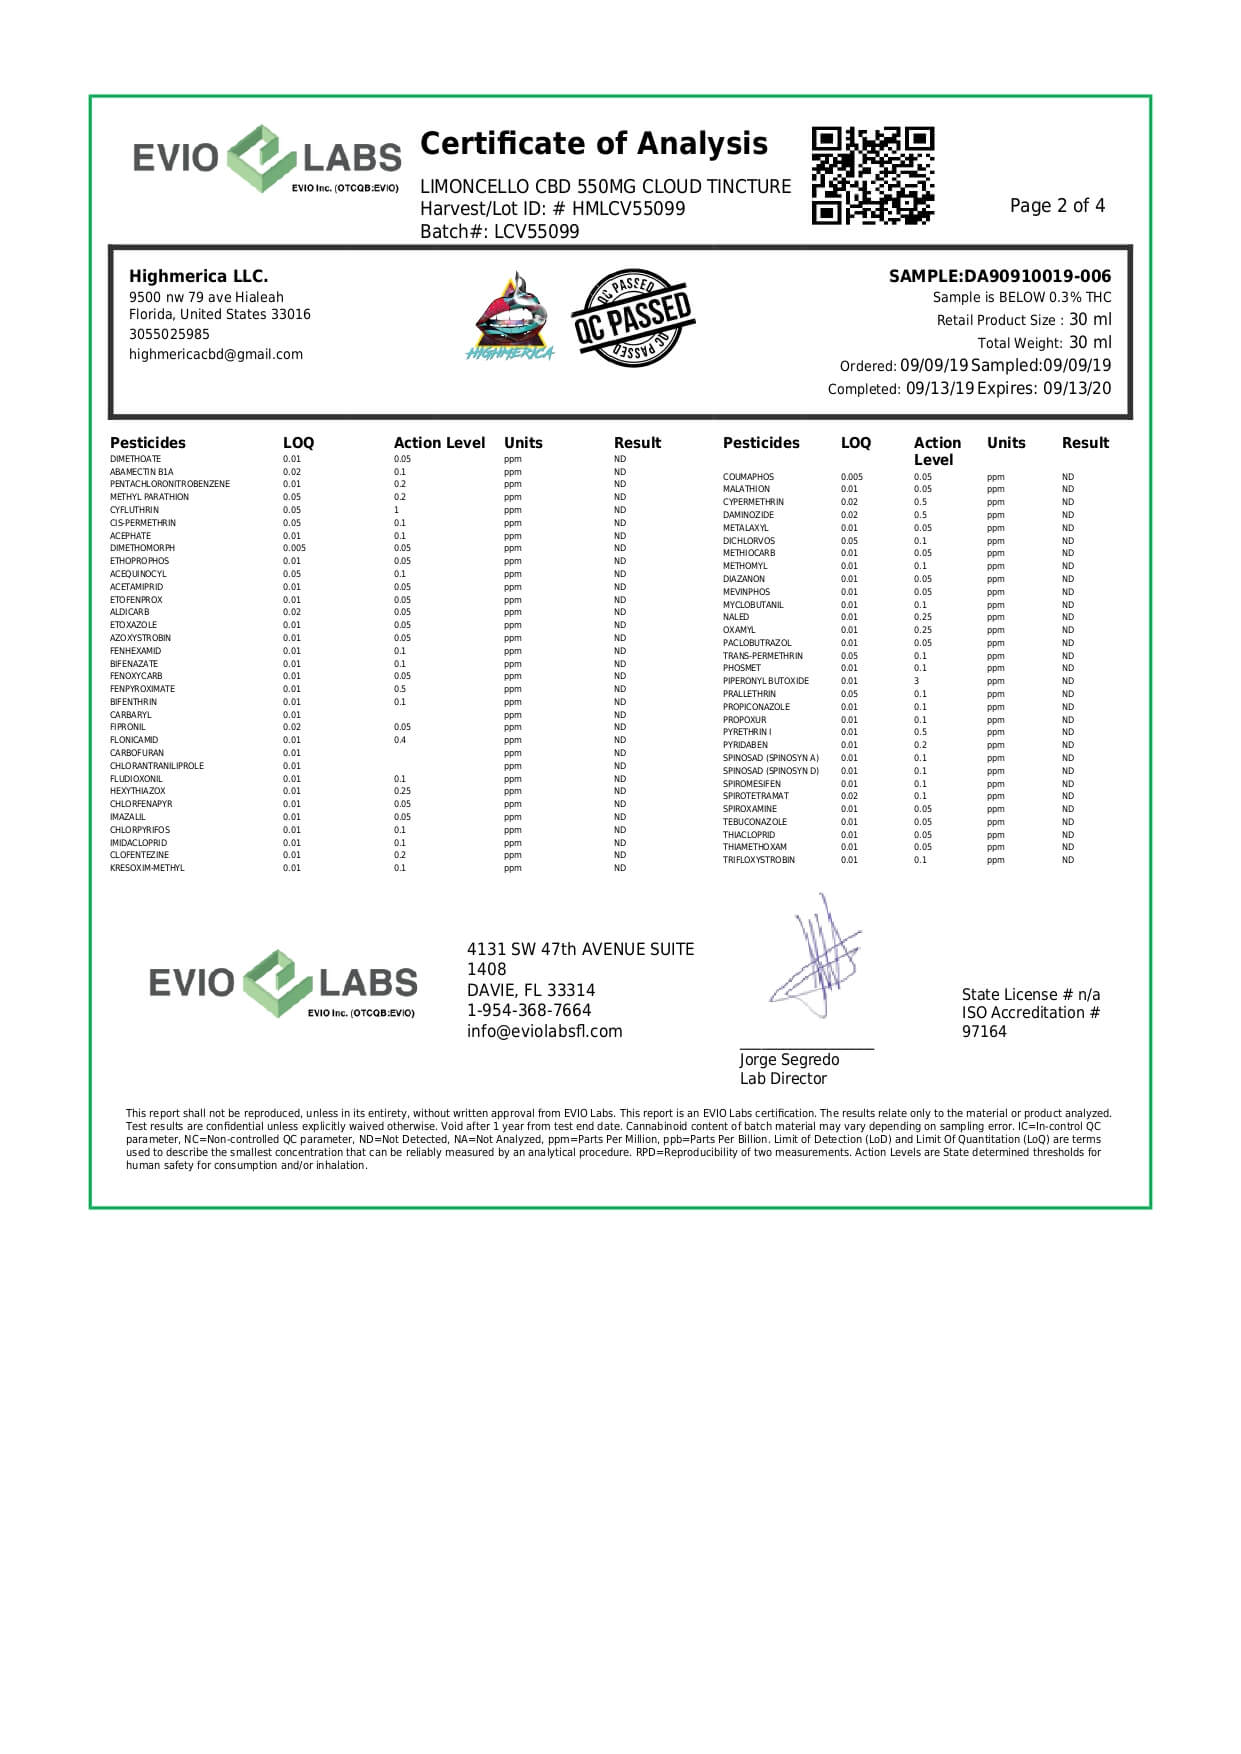 Highmerica CBD Vape Tincture Limoncello Lab Report